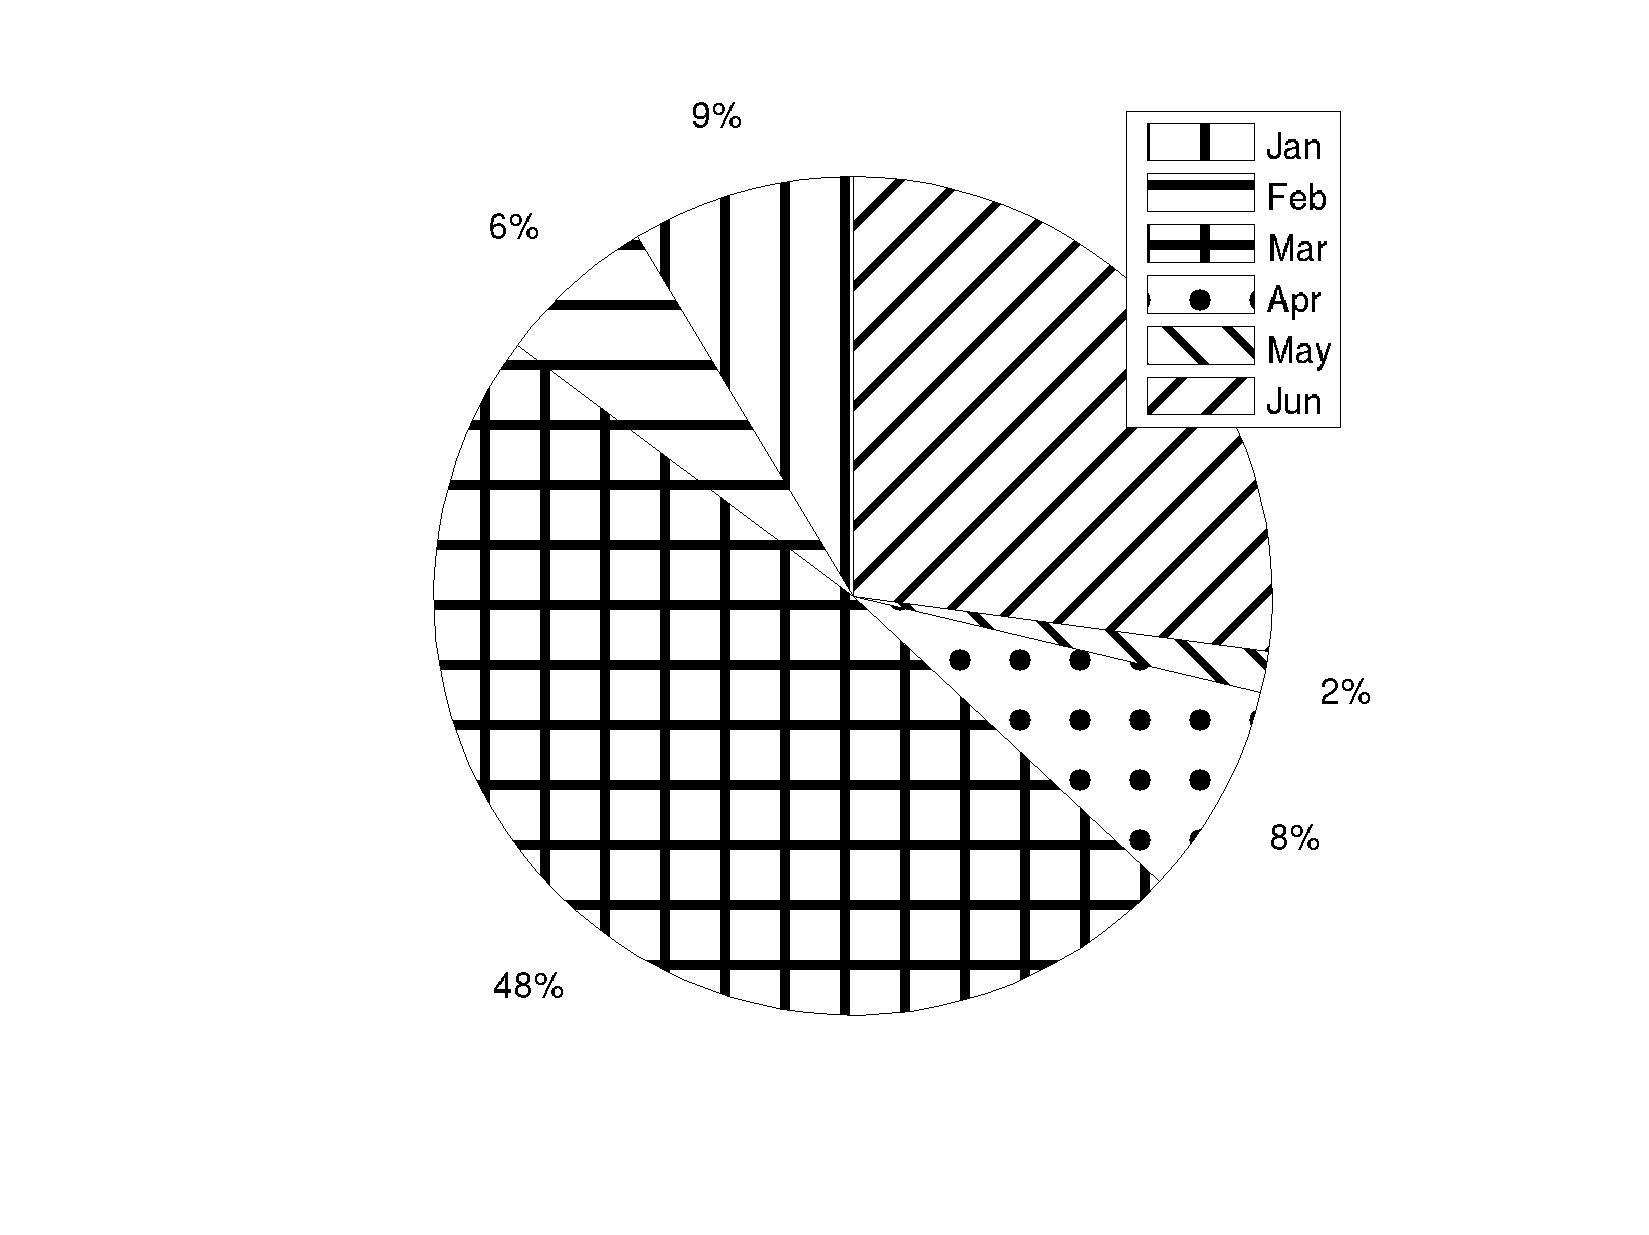 Hatch fill patterns plus plus - File Exchange - MATLAB Central